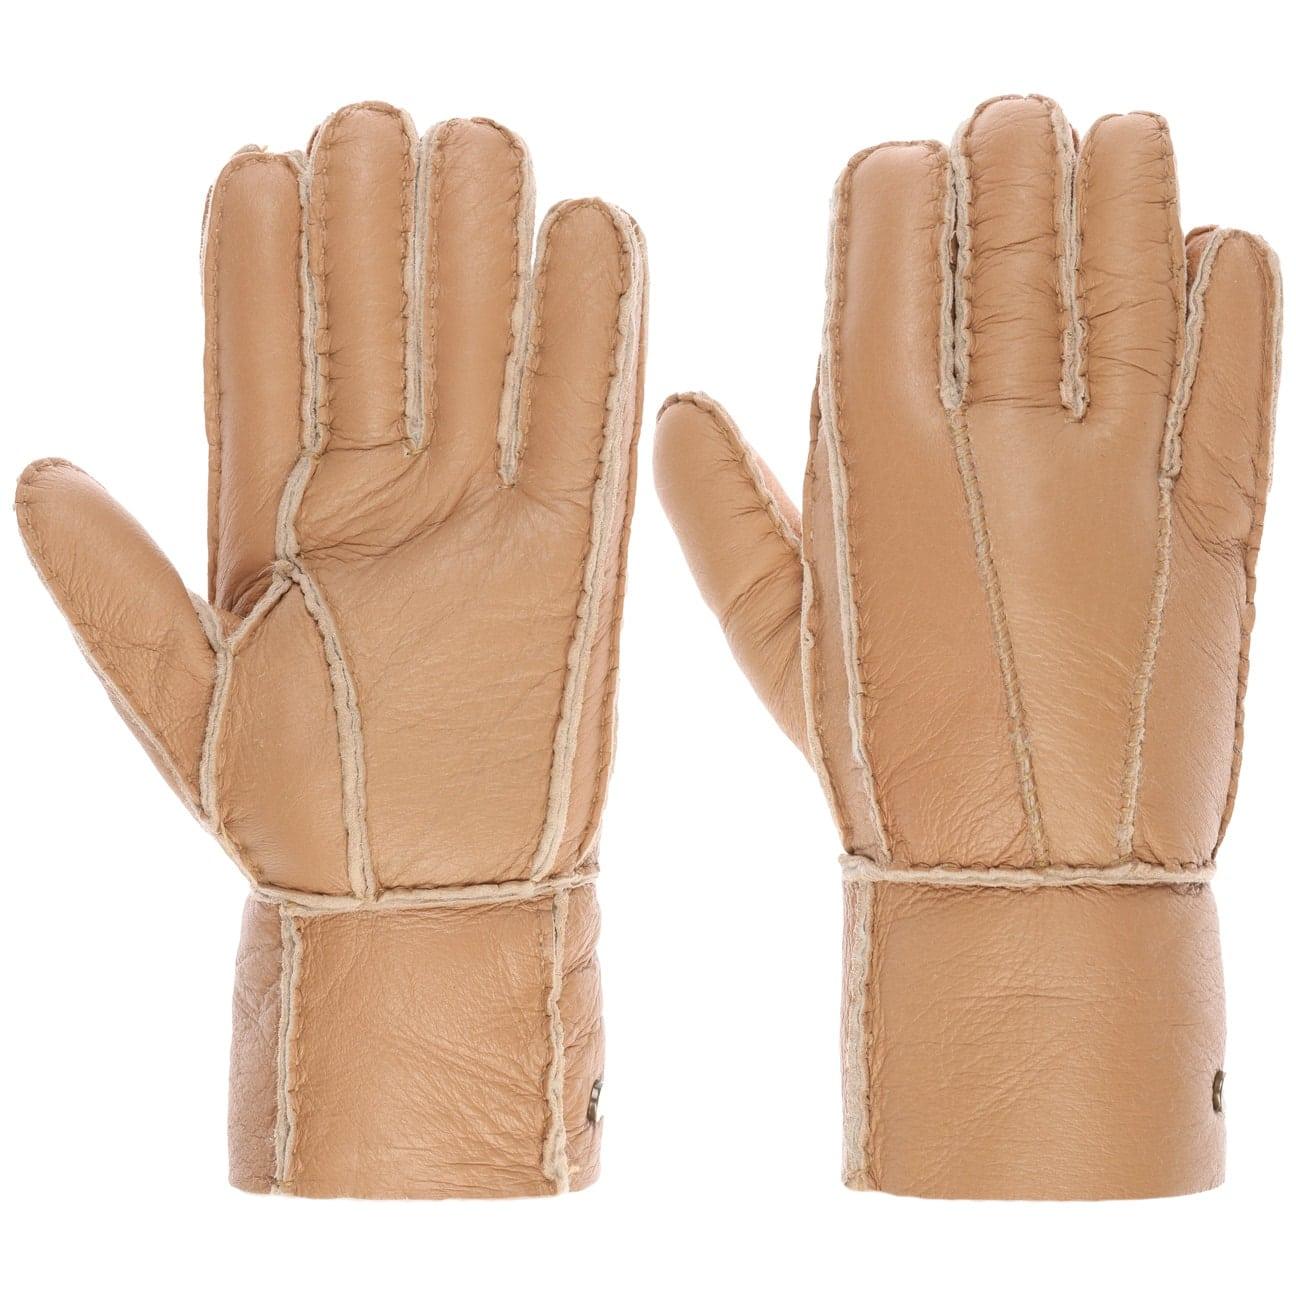 Gloves Lamb Handschuhe by Stetson